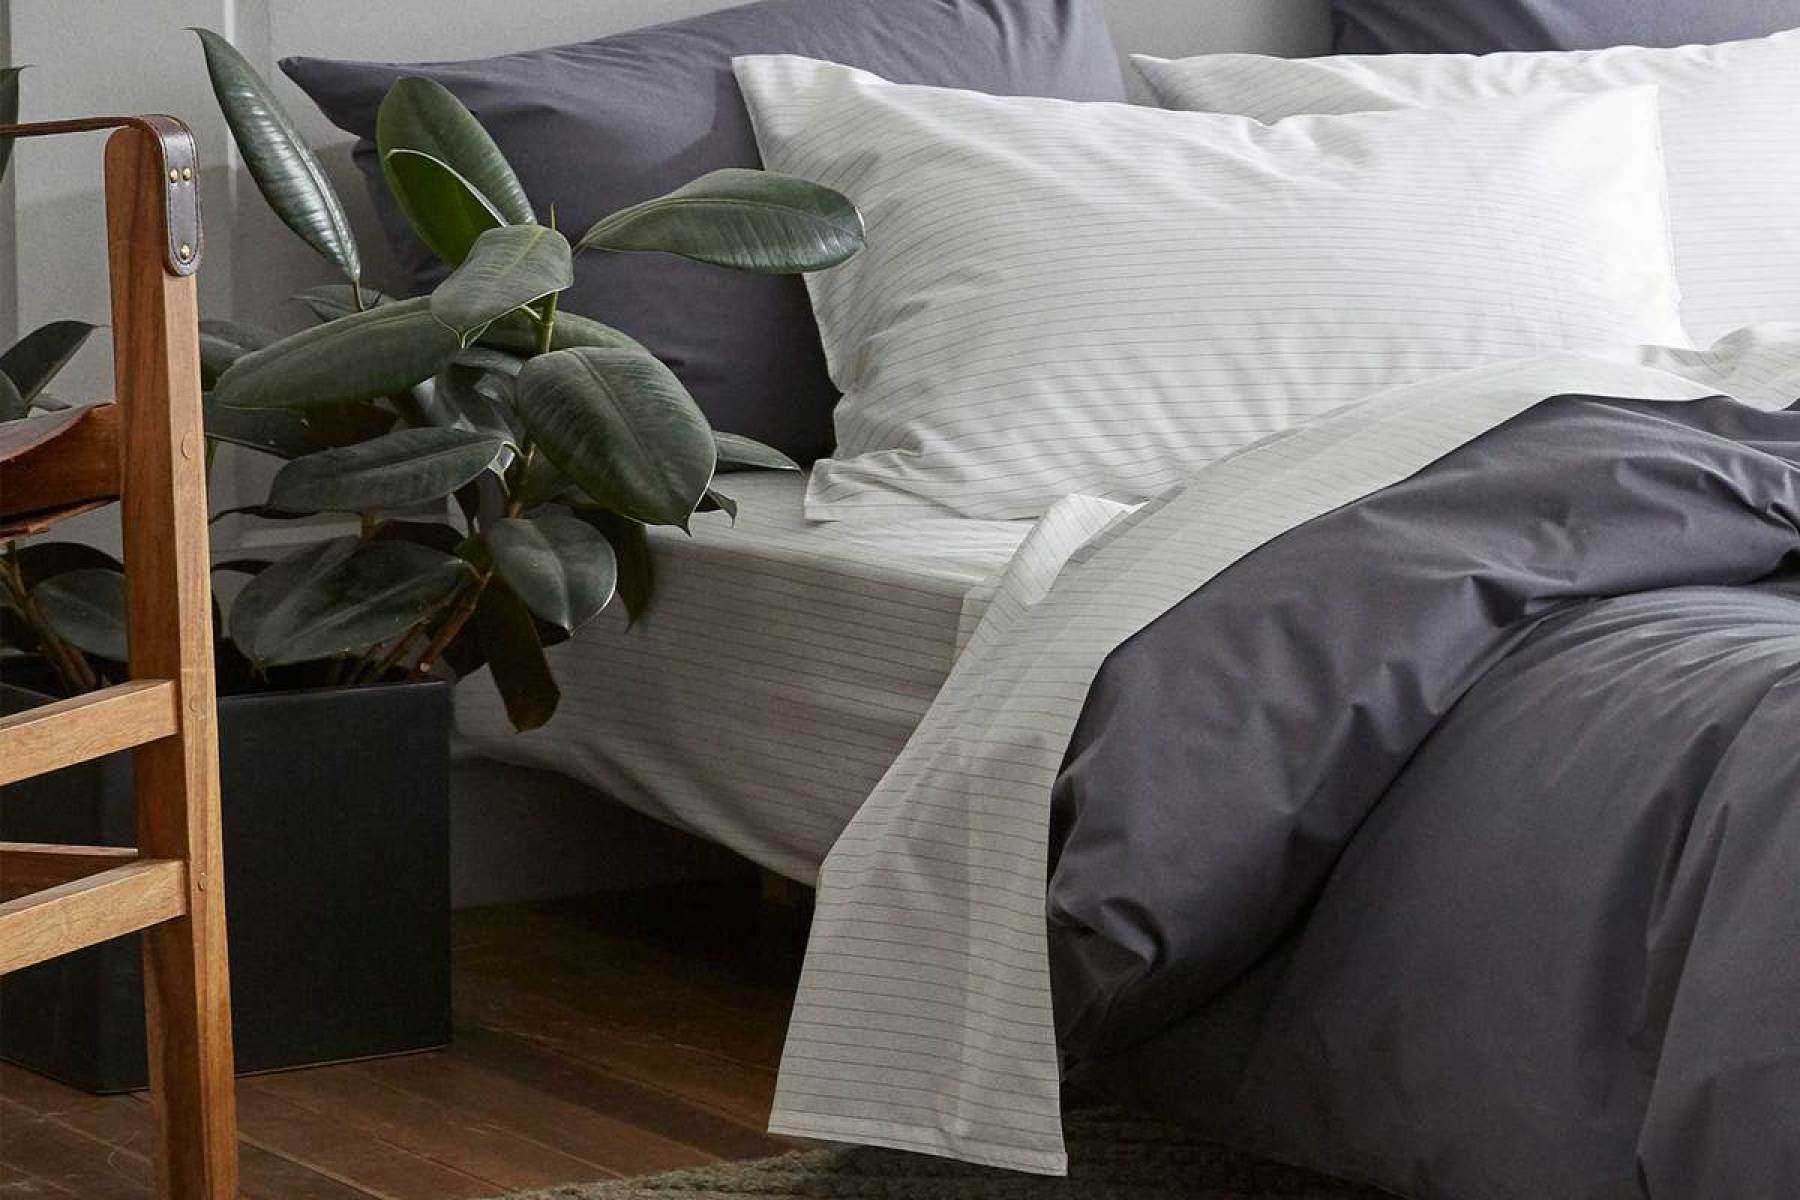 Best Bed Sheets 2020 Brooklinen Parachute L L Bean Bedding Reviews Rolling Stone